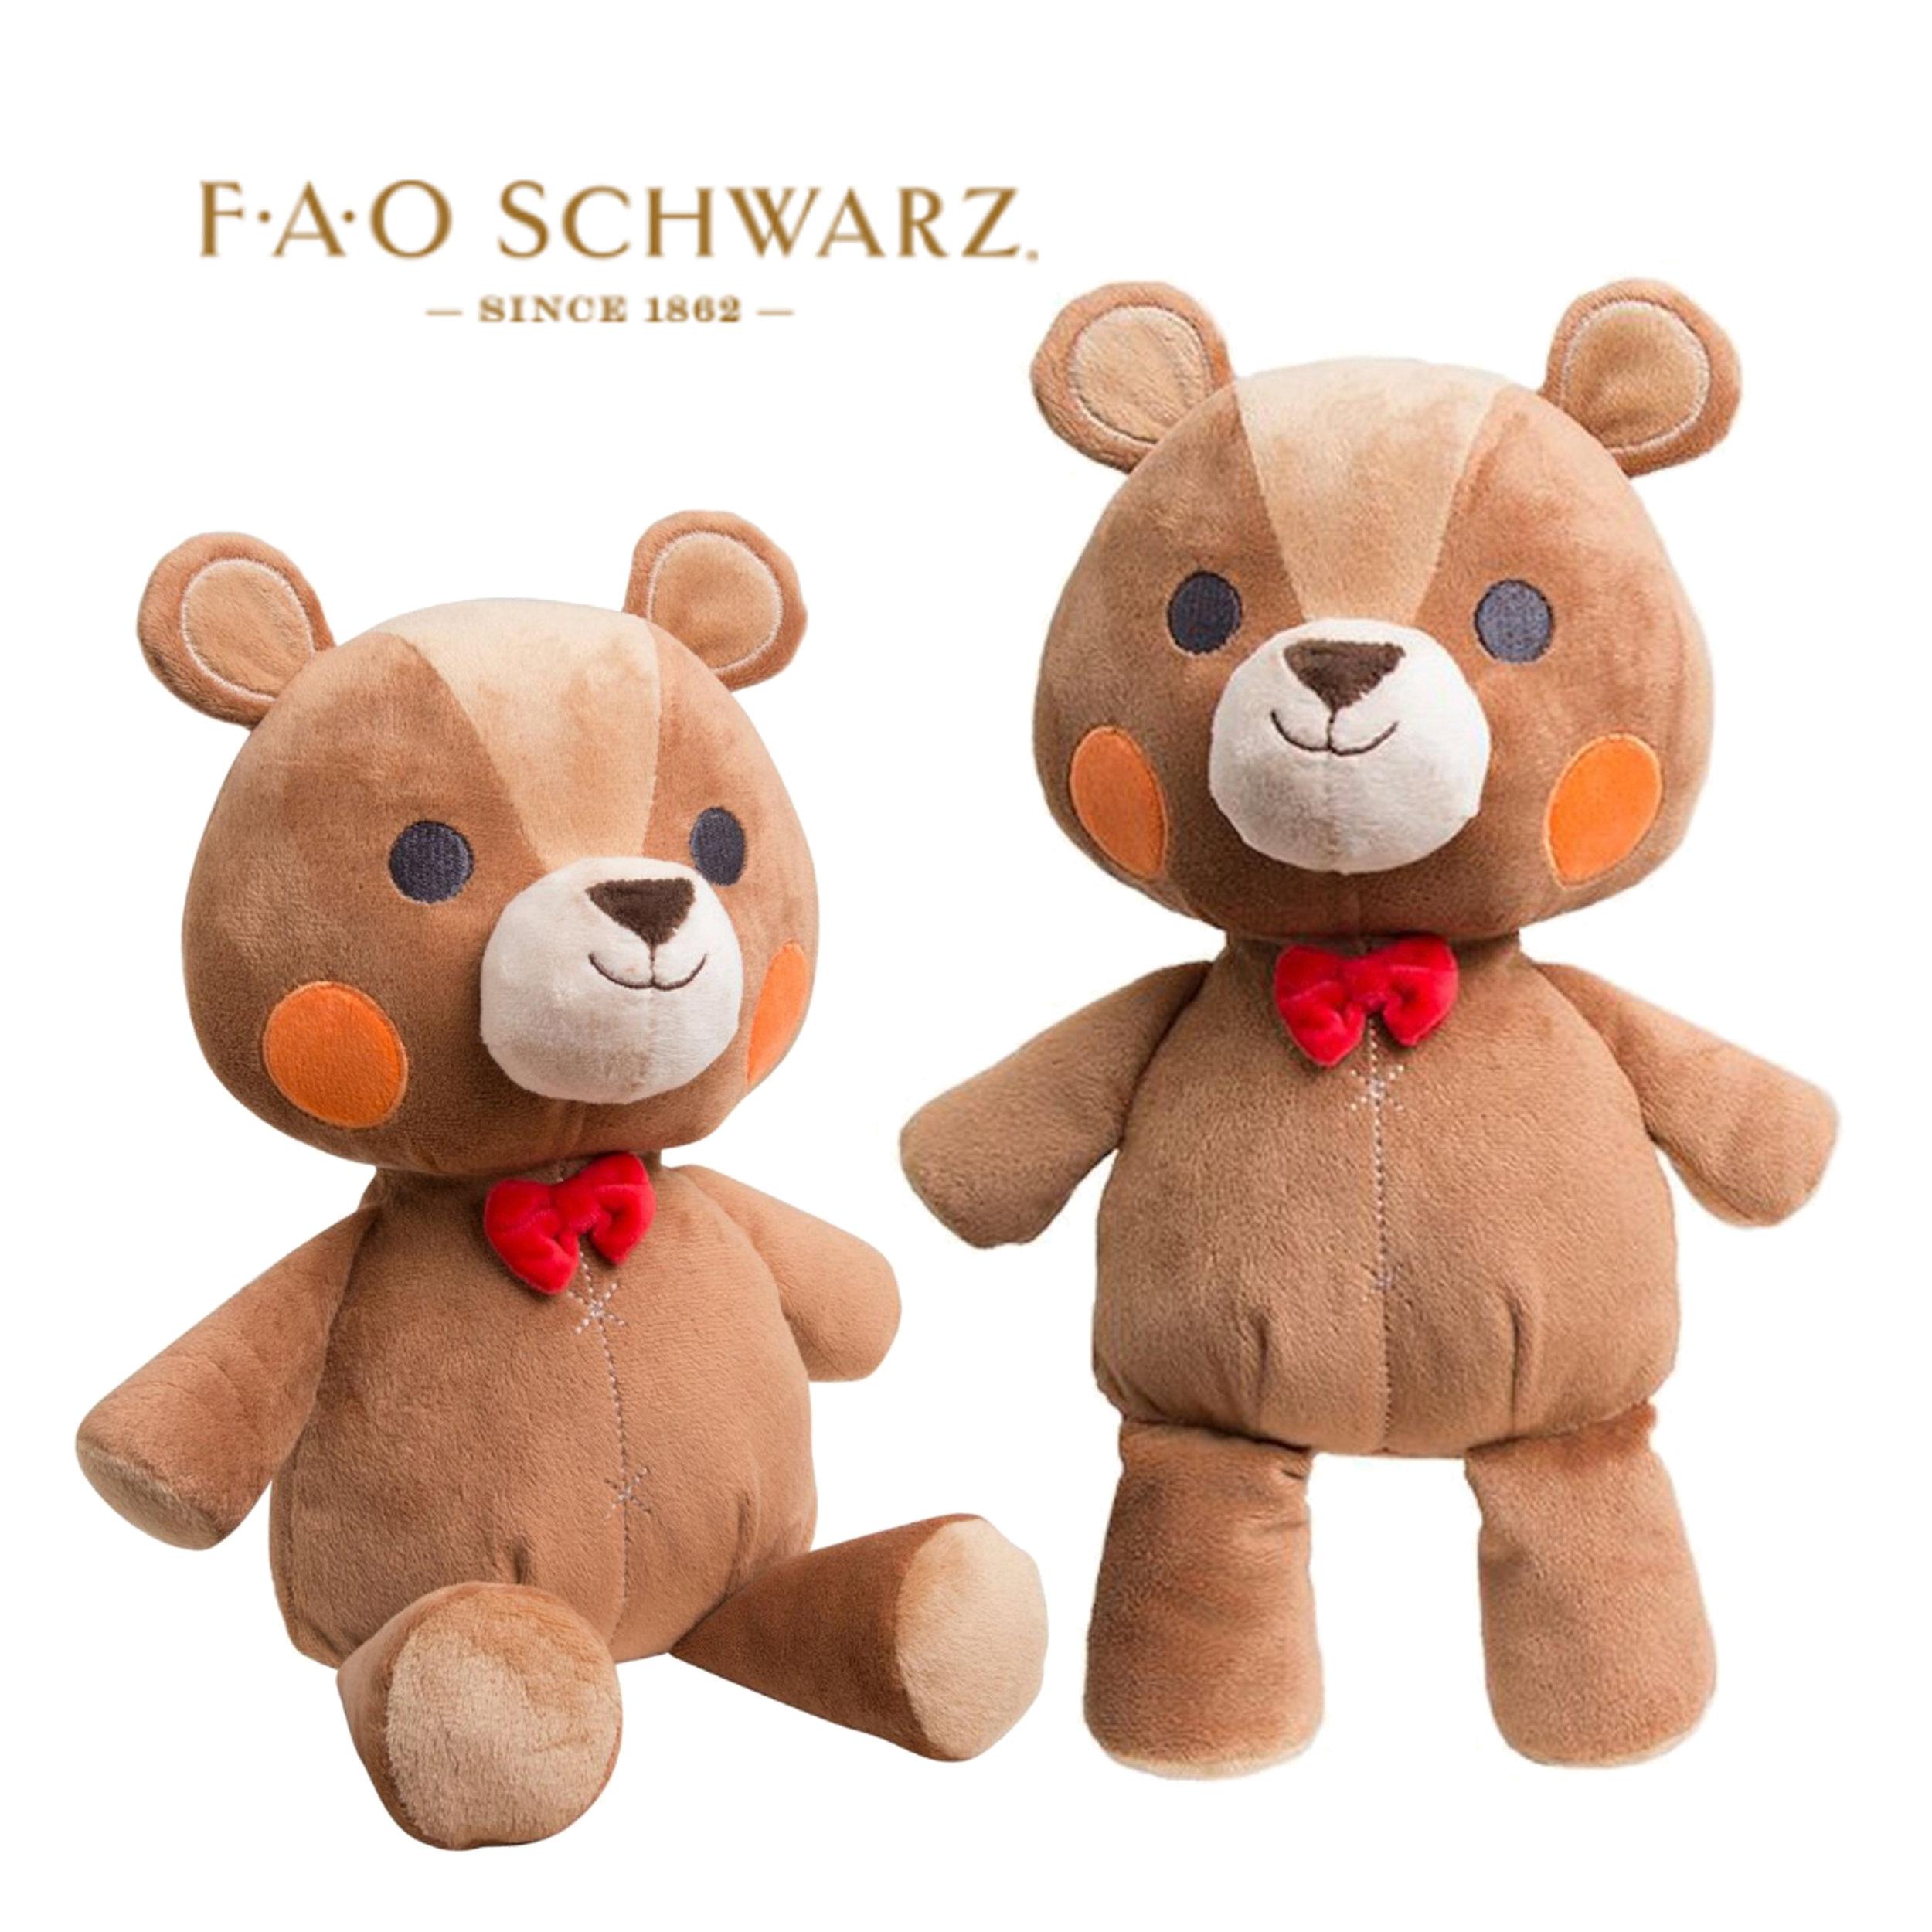 fao_schwarz_plush_bear_jchou.jpg